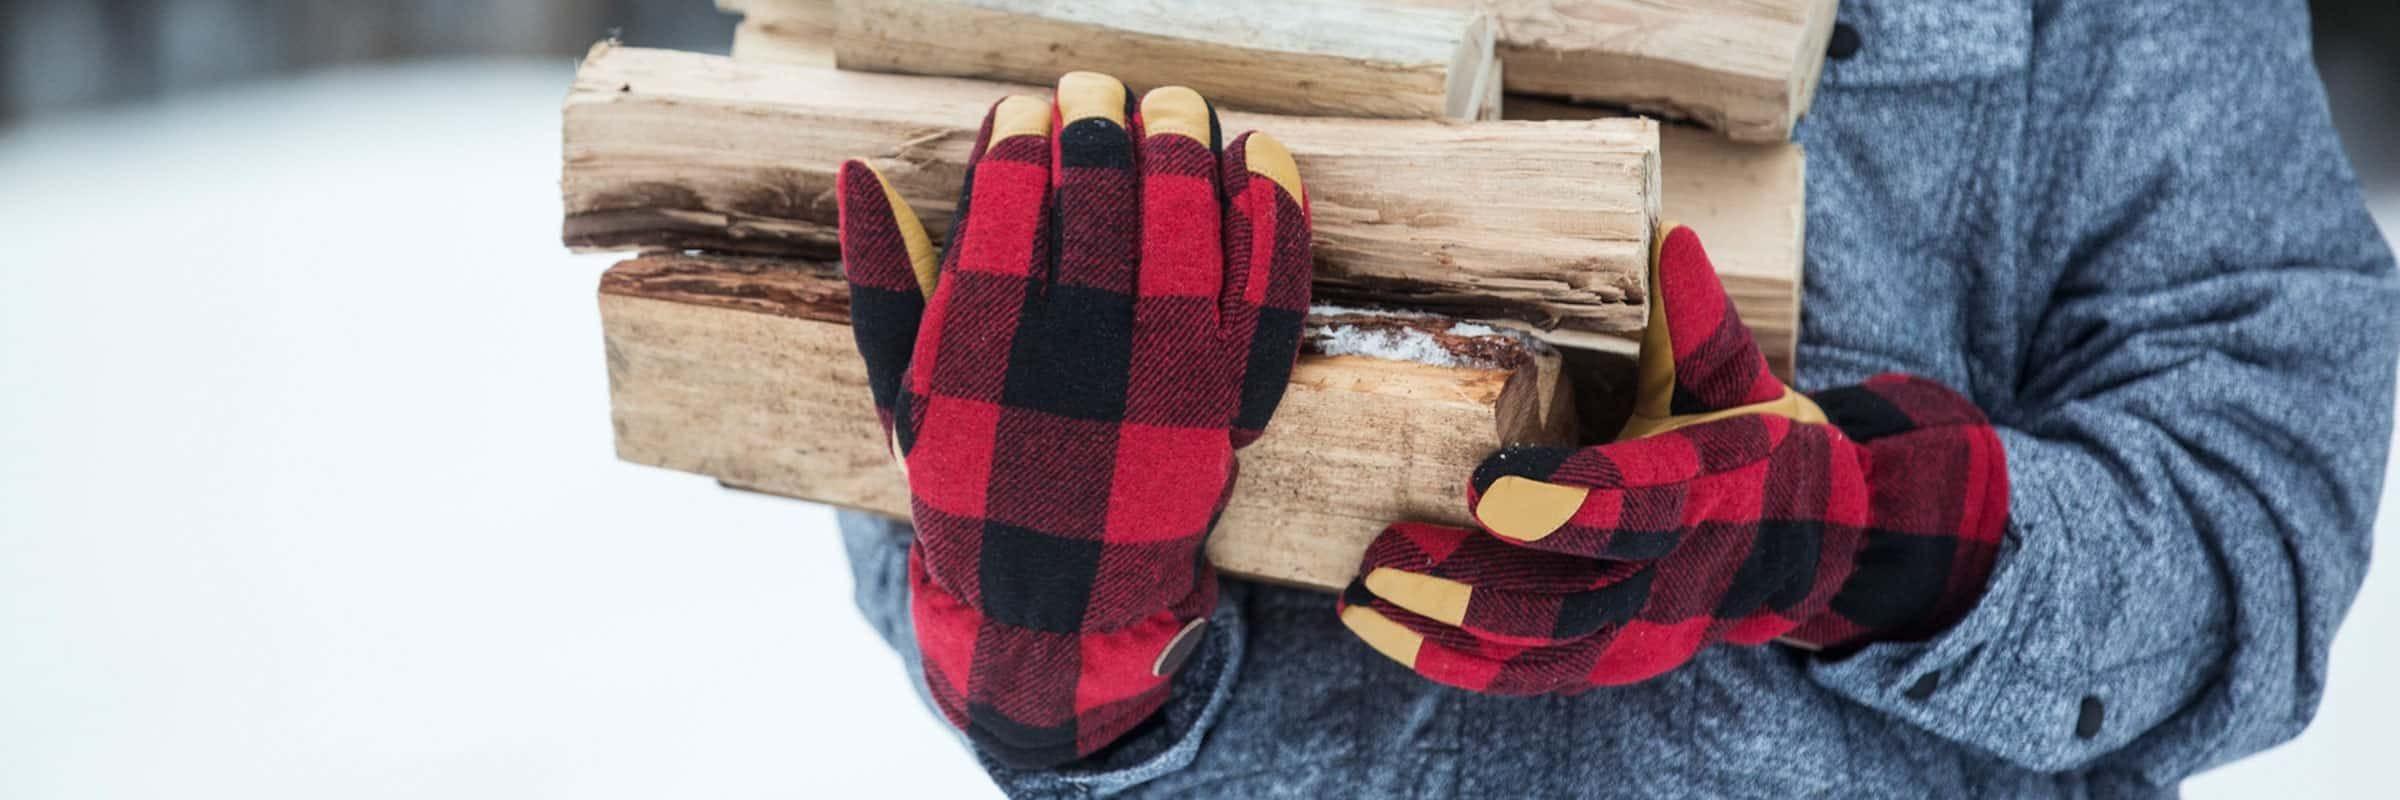 Kombi's Elite & Metro Lines Rethink Winter Handwear